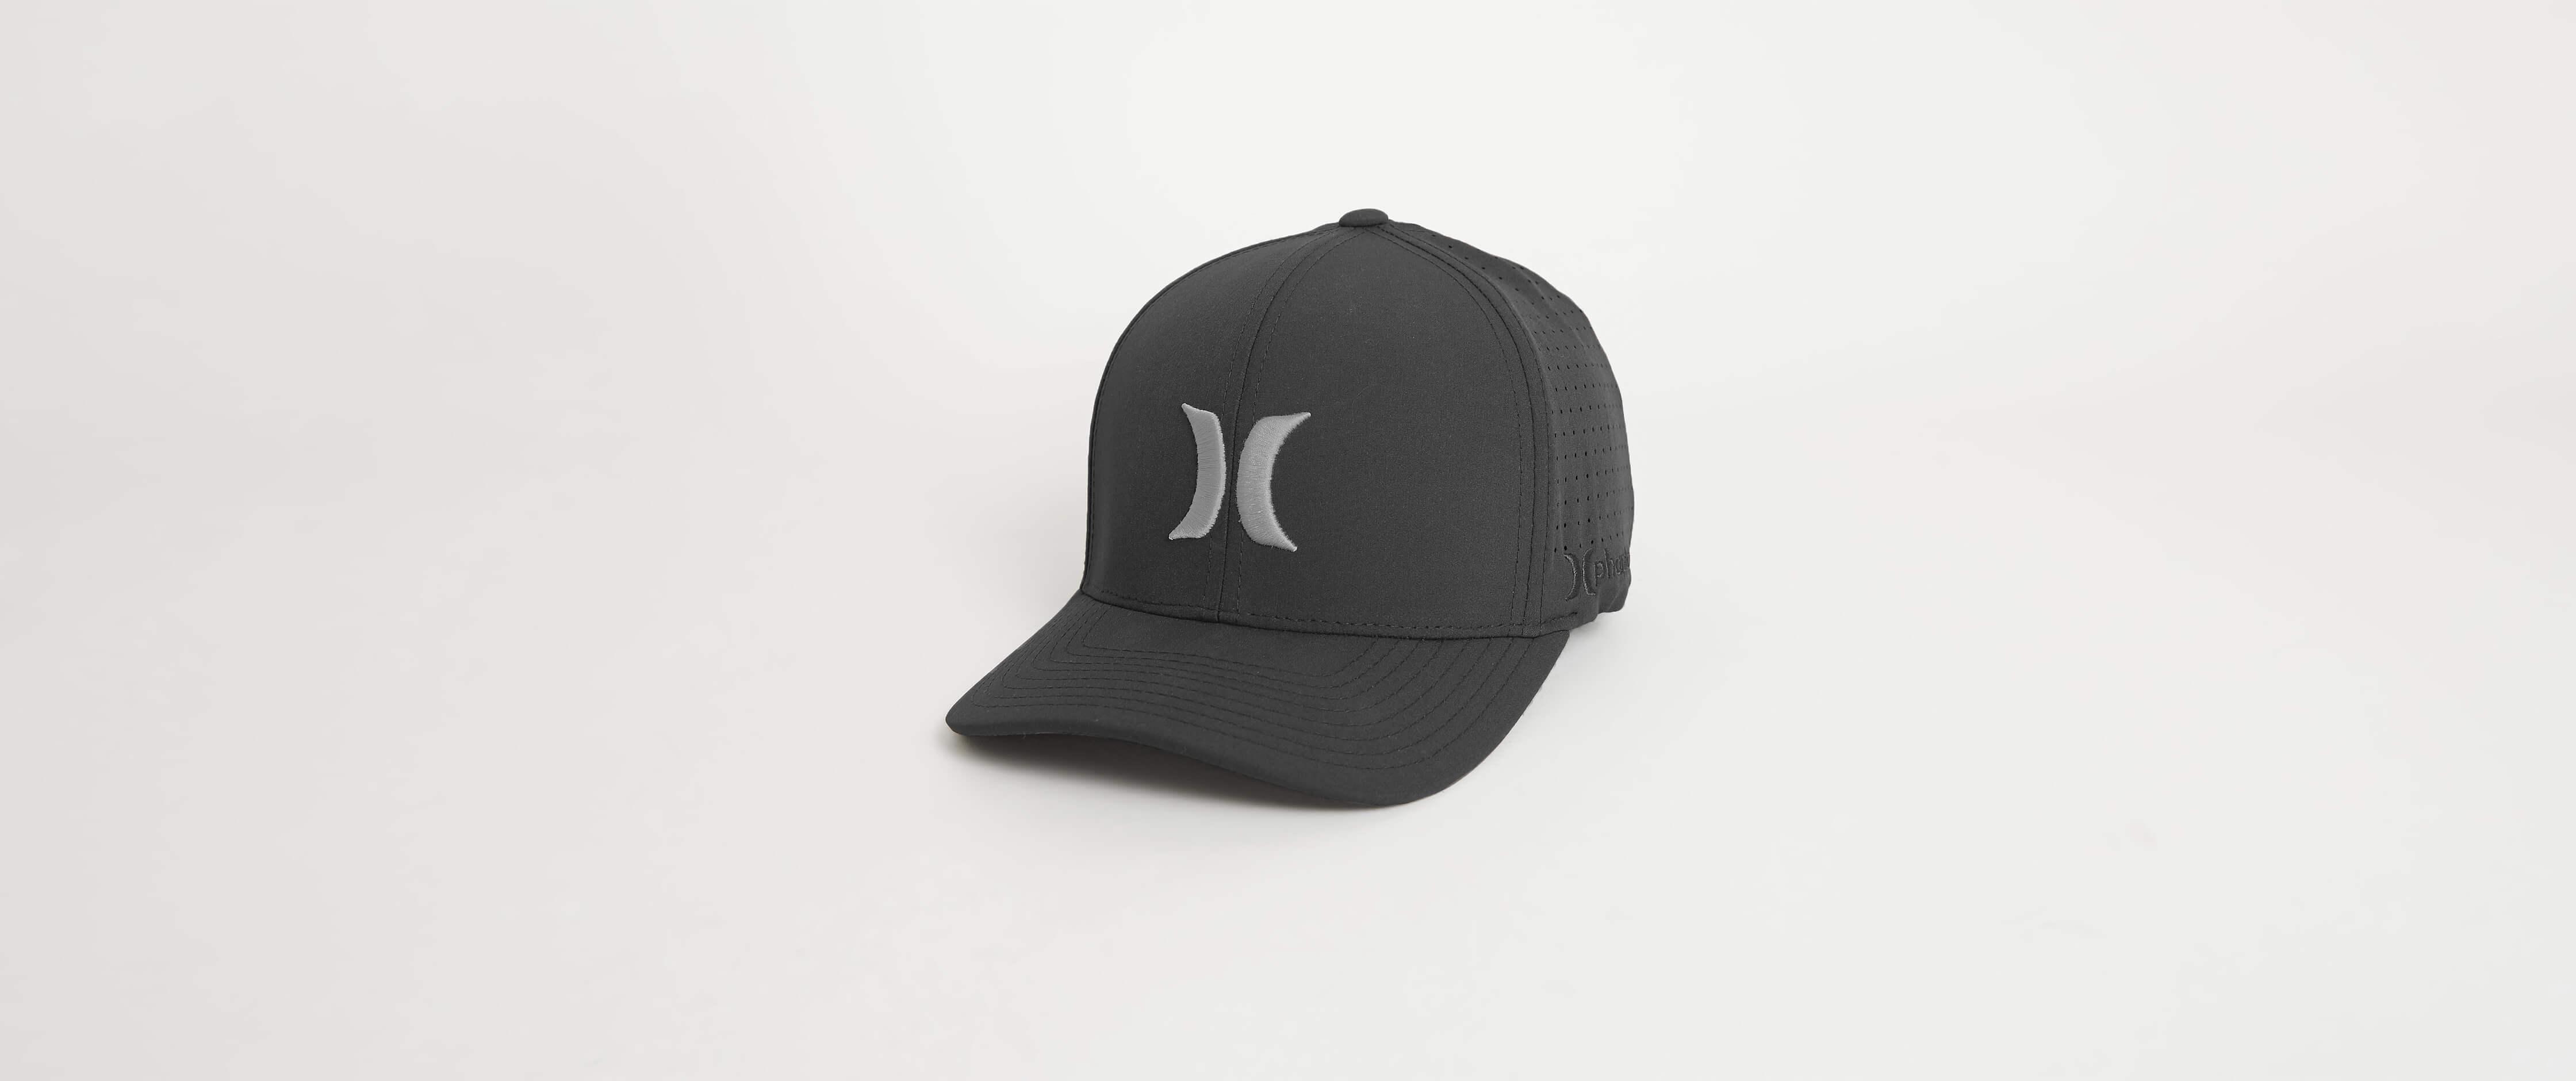 426fad510 greece hurley phantom vapor hat a0ed6 d7889